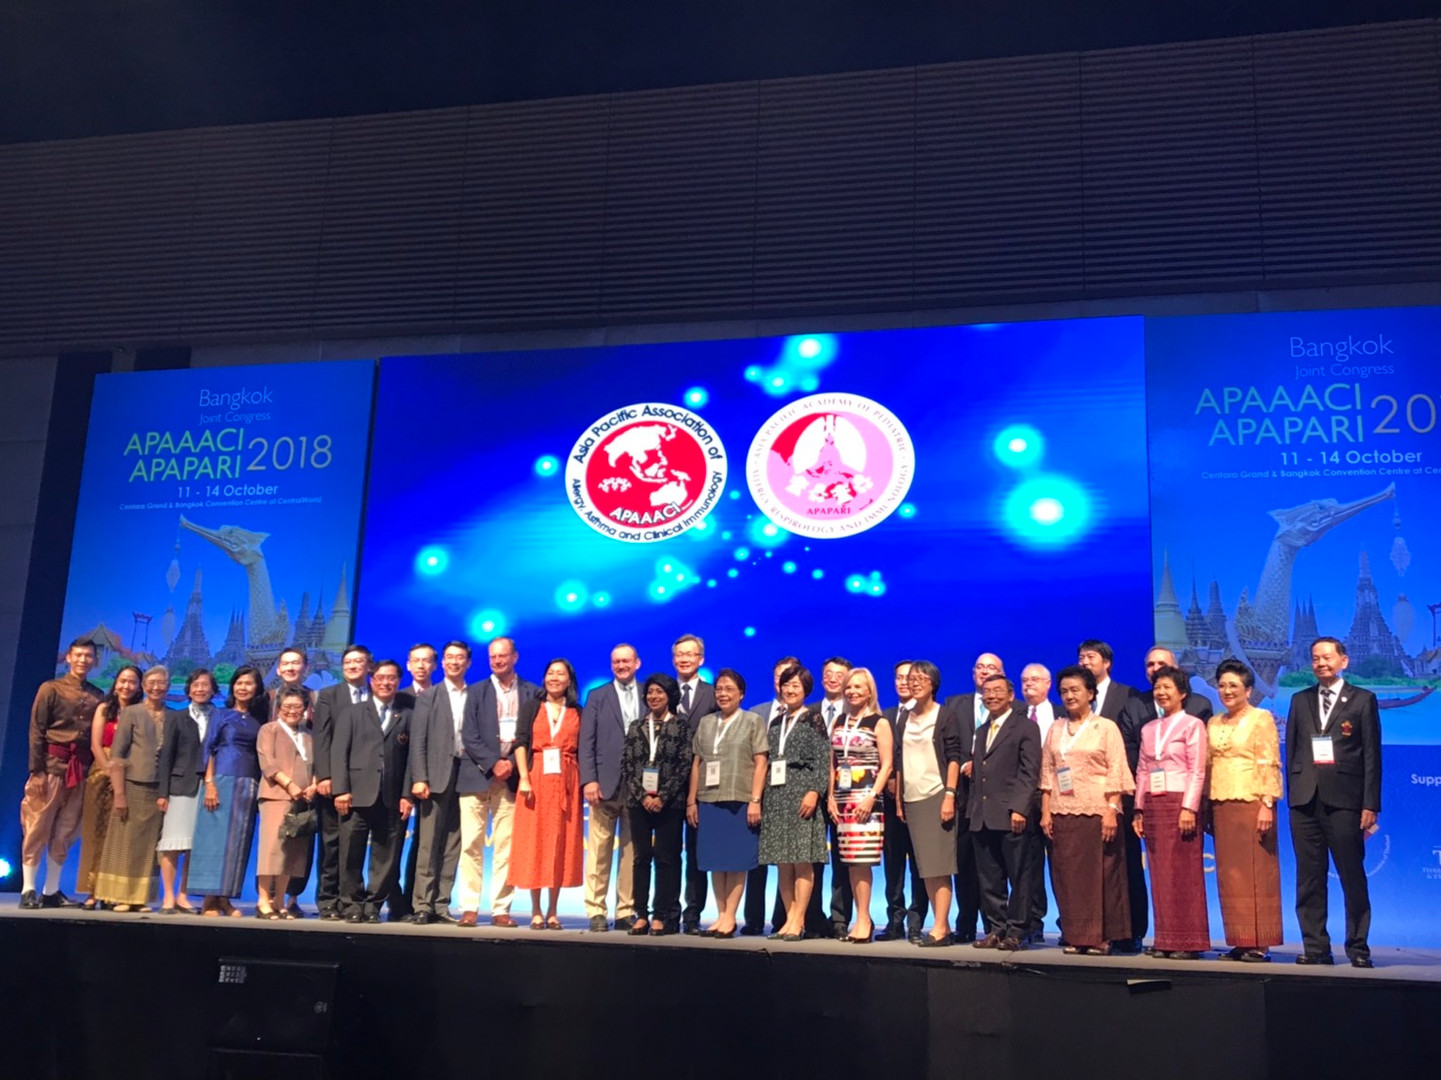 APAAACI 2018 opening ceremony.JPG